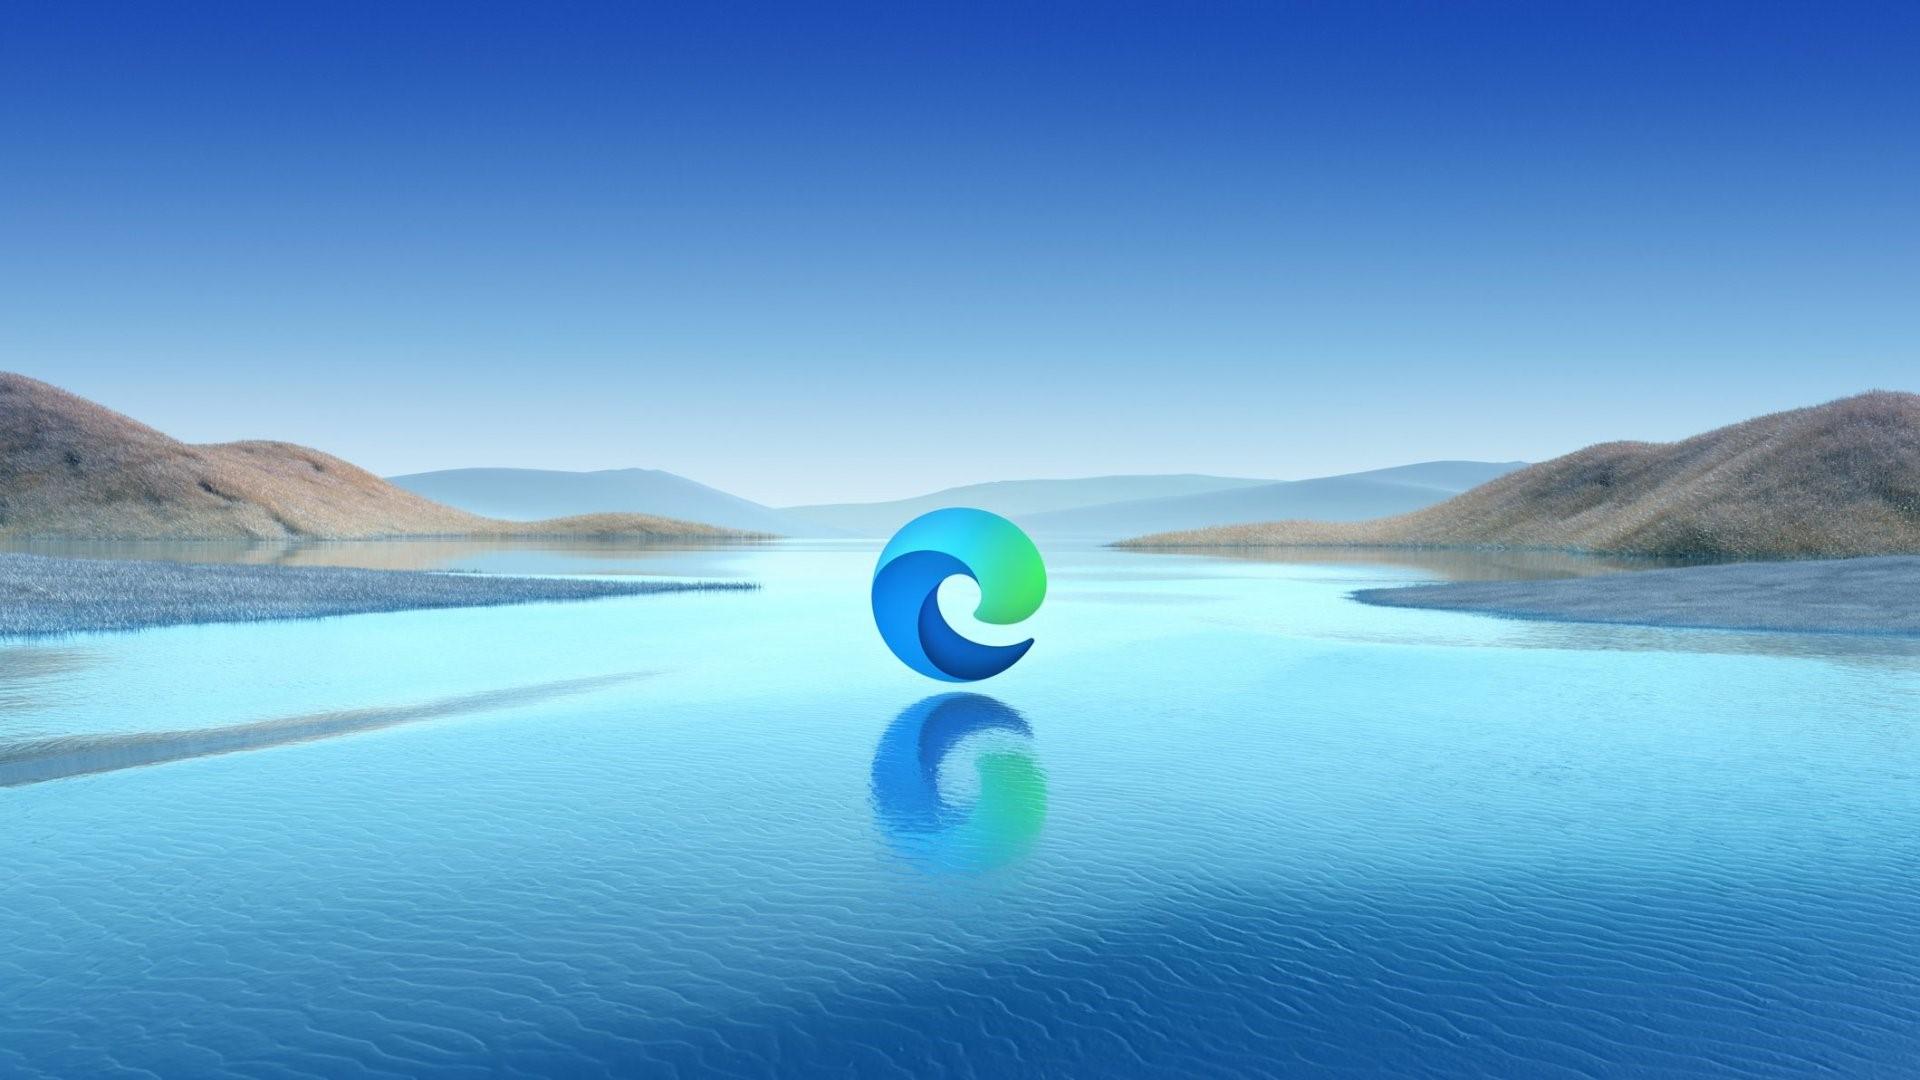 #Microsoft,#Edge,#Browser,Ratgeber,Tipps,Tricks,Hilfe,Anleitungen,FAQ,Ratgeber,Edge Lesezeiche...jpg